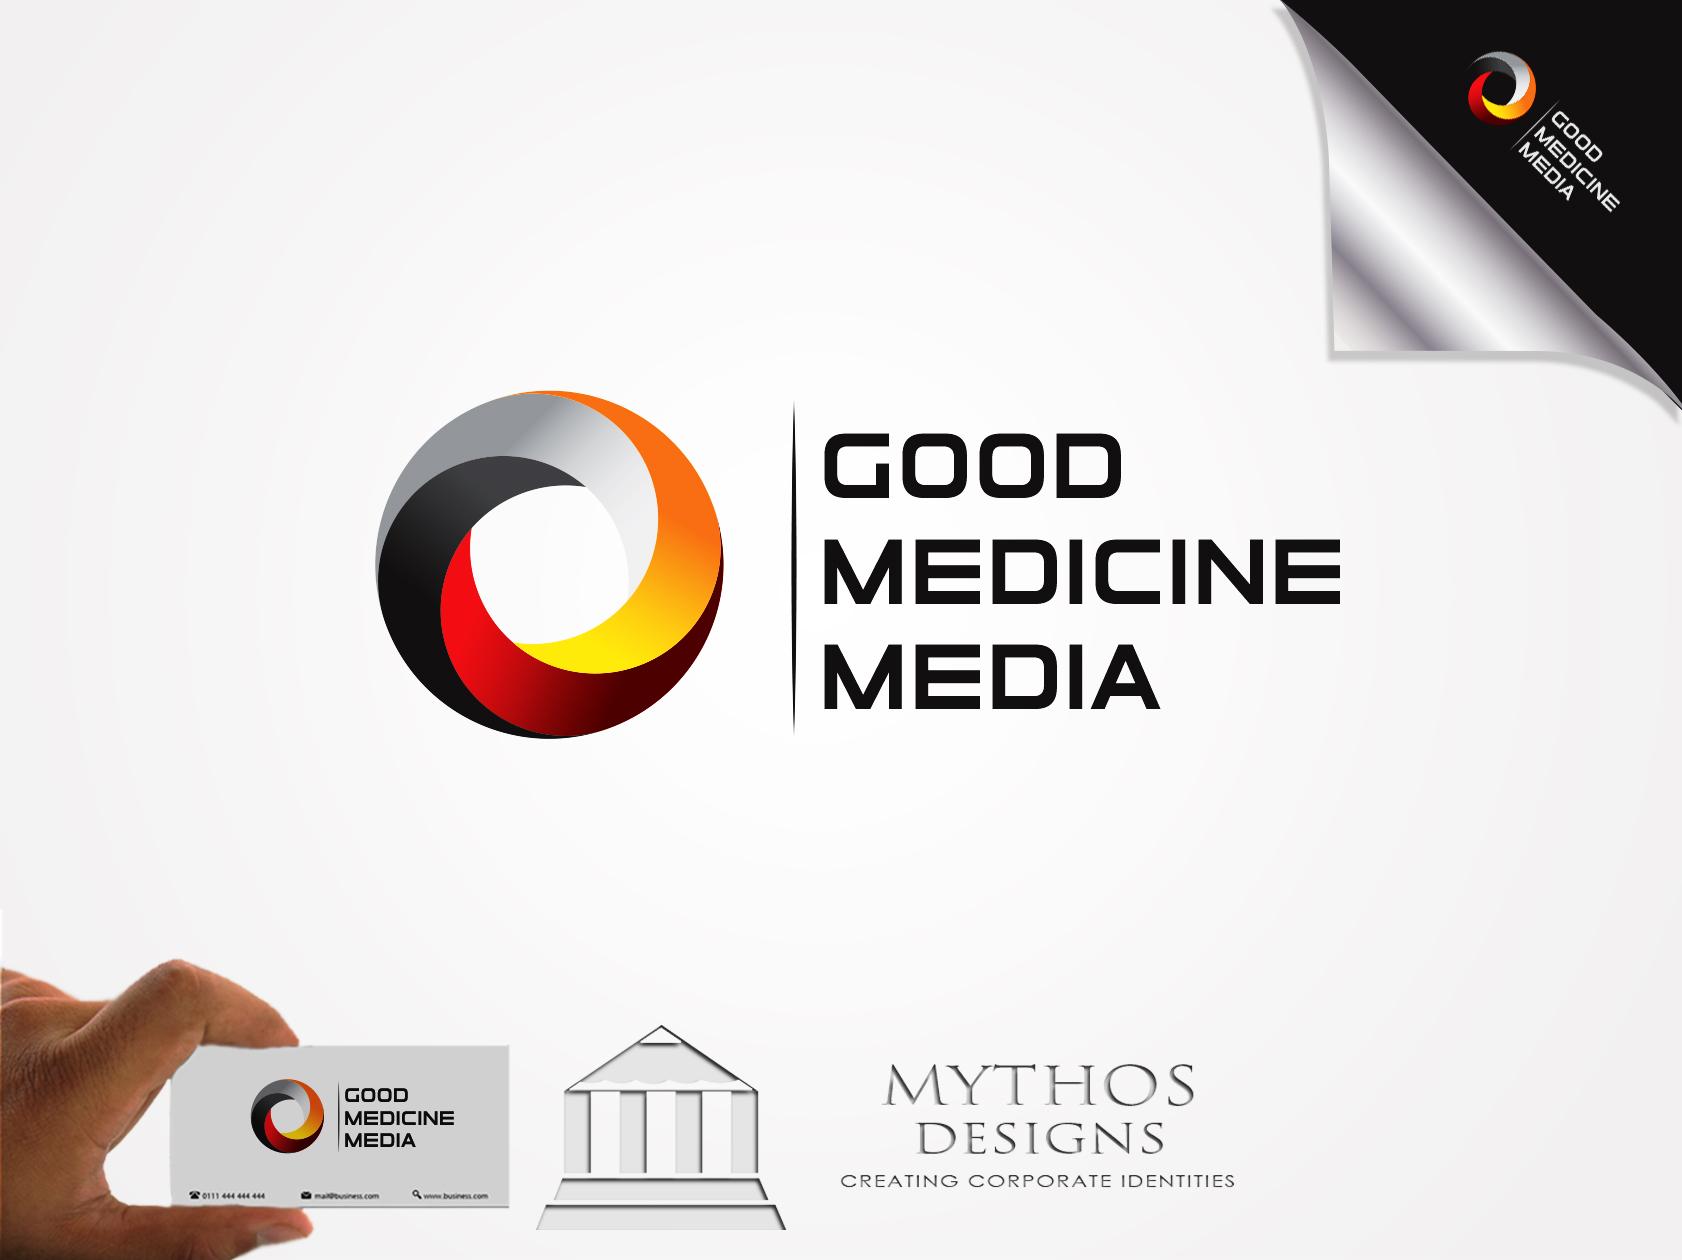 Logo Design by Mythos Designs - Entry No. 180 in the Logo Design Contest Good Medicine Media Logo Design.